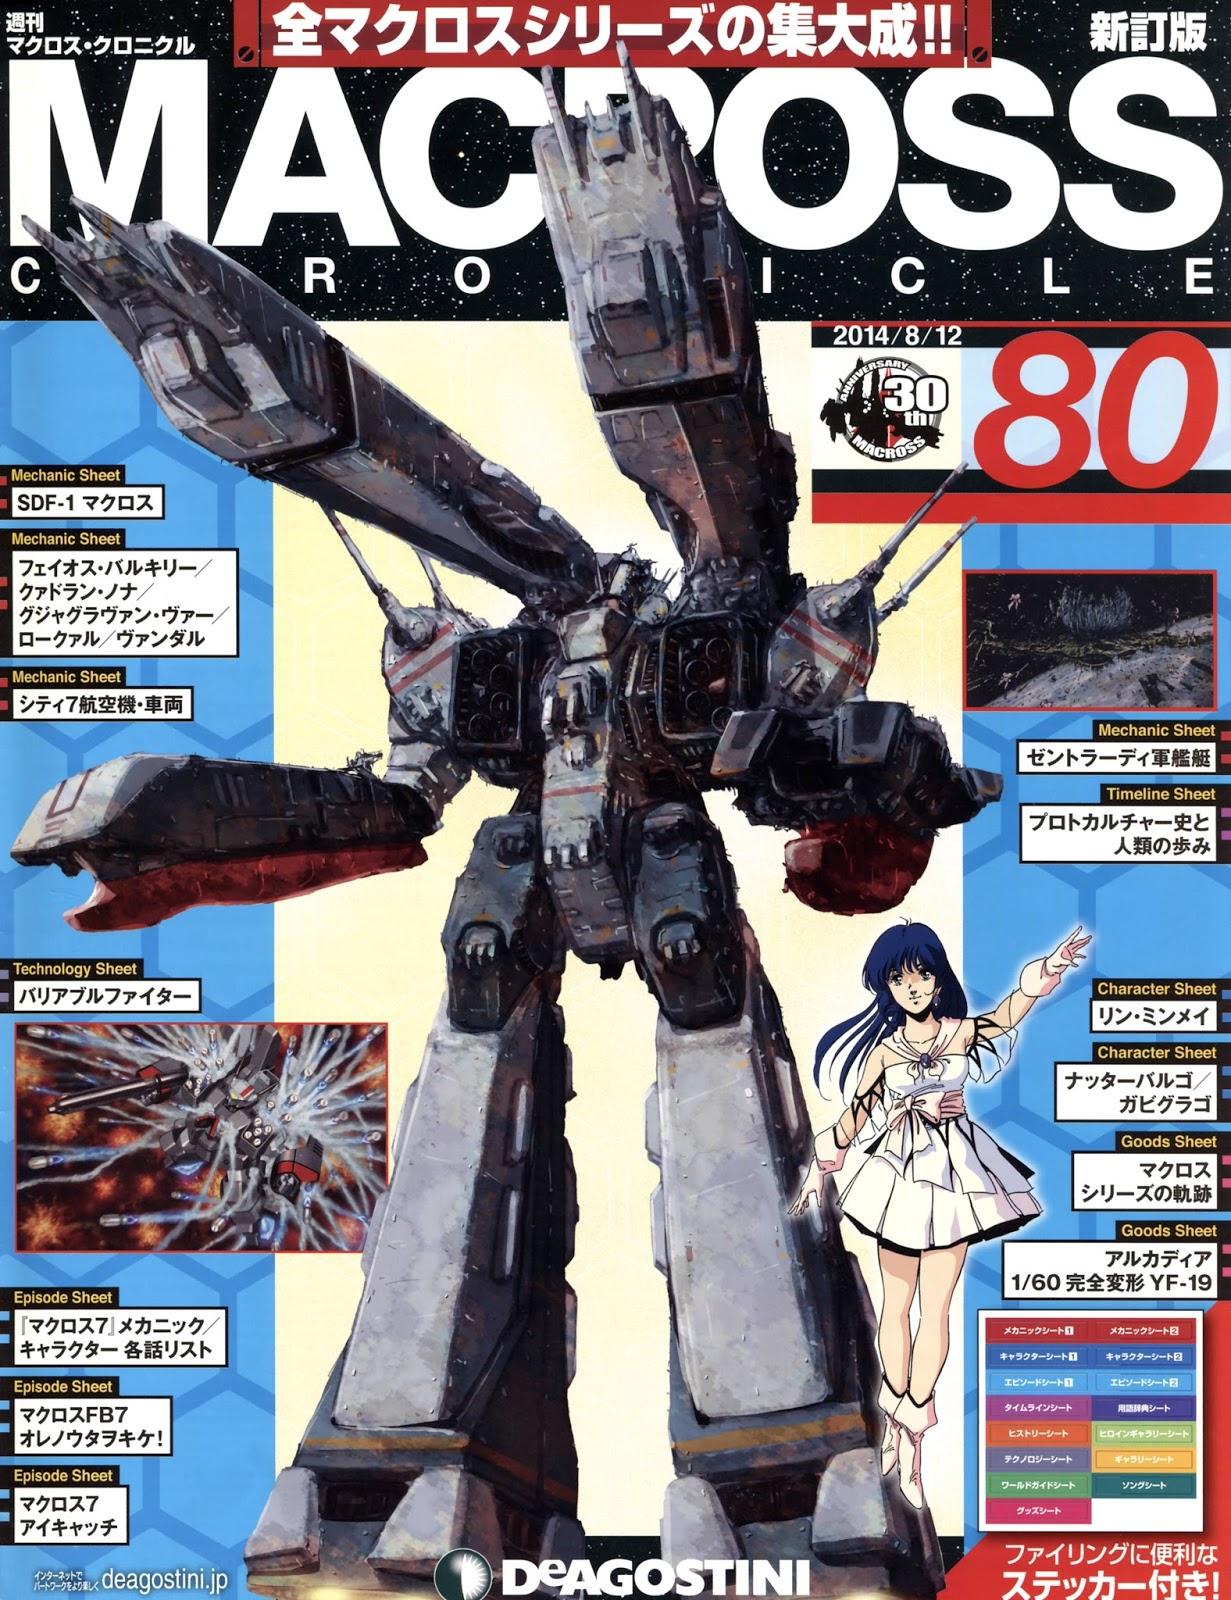 Download full scans: hobby japan magazine april 2012 issue | gunjap.